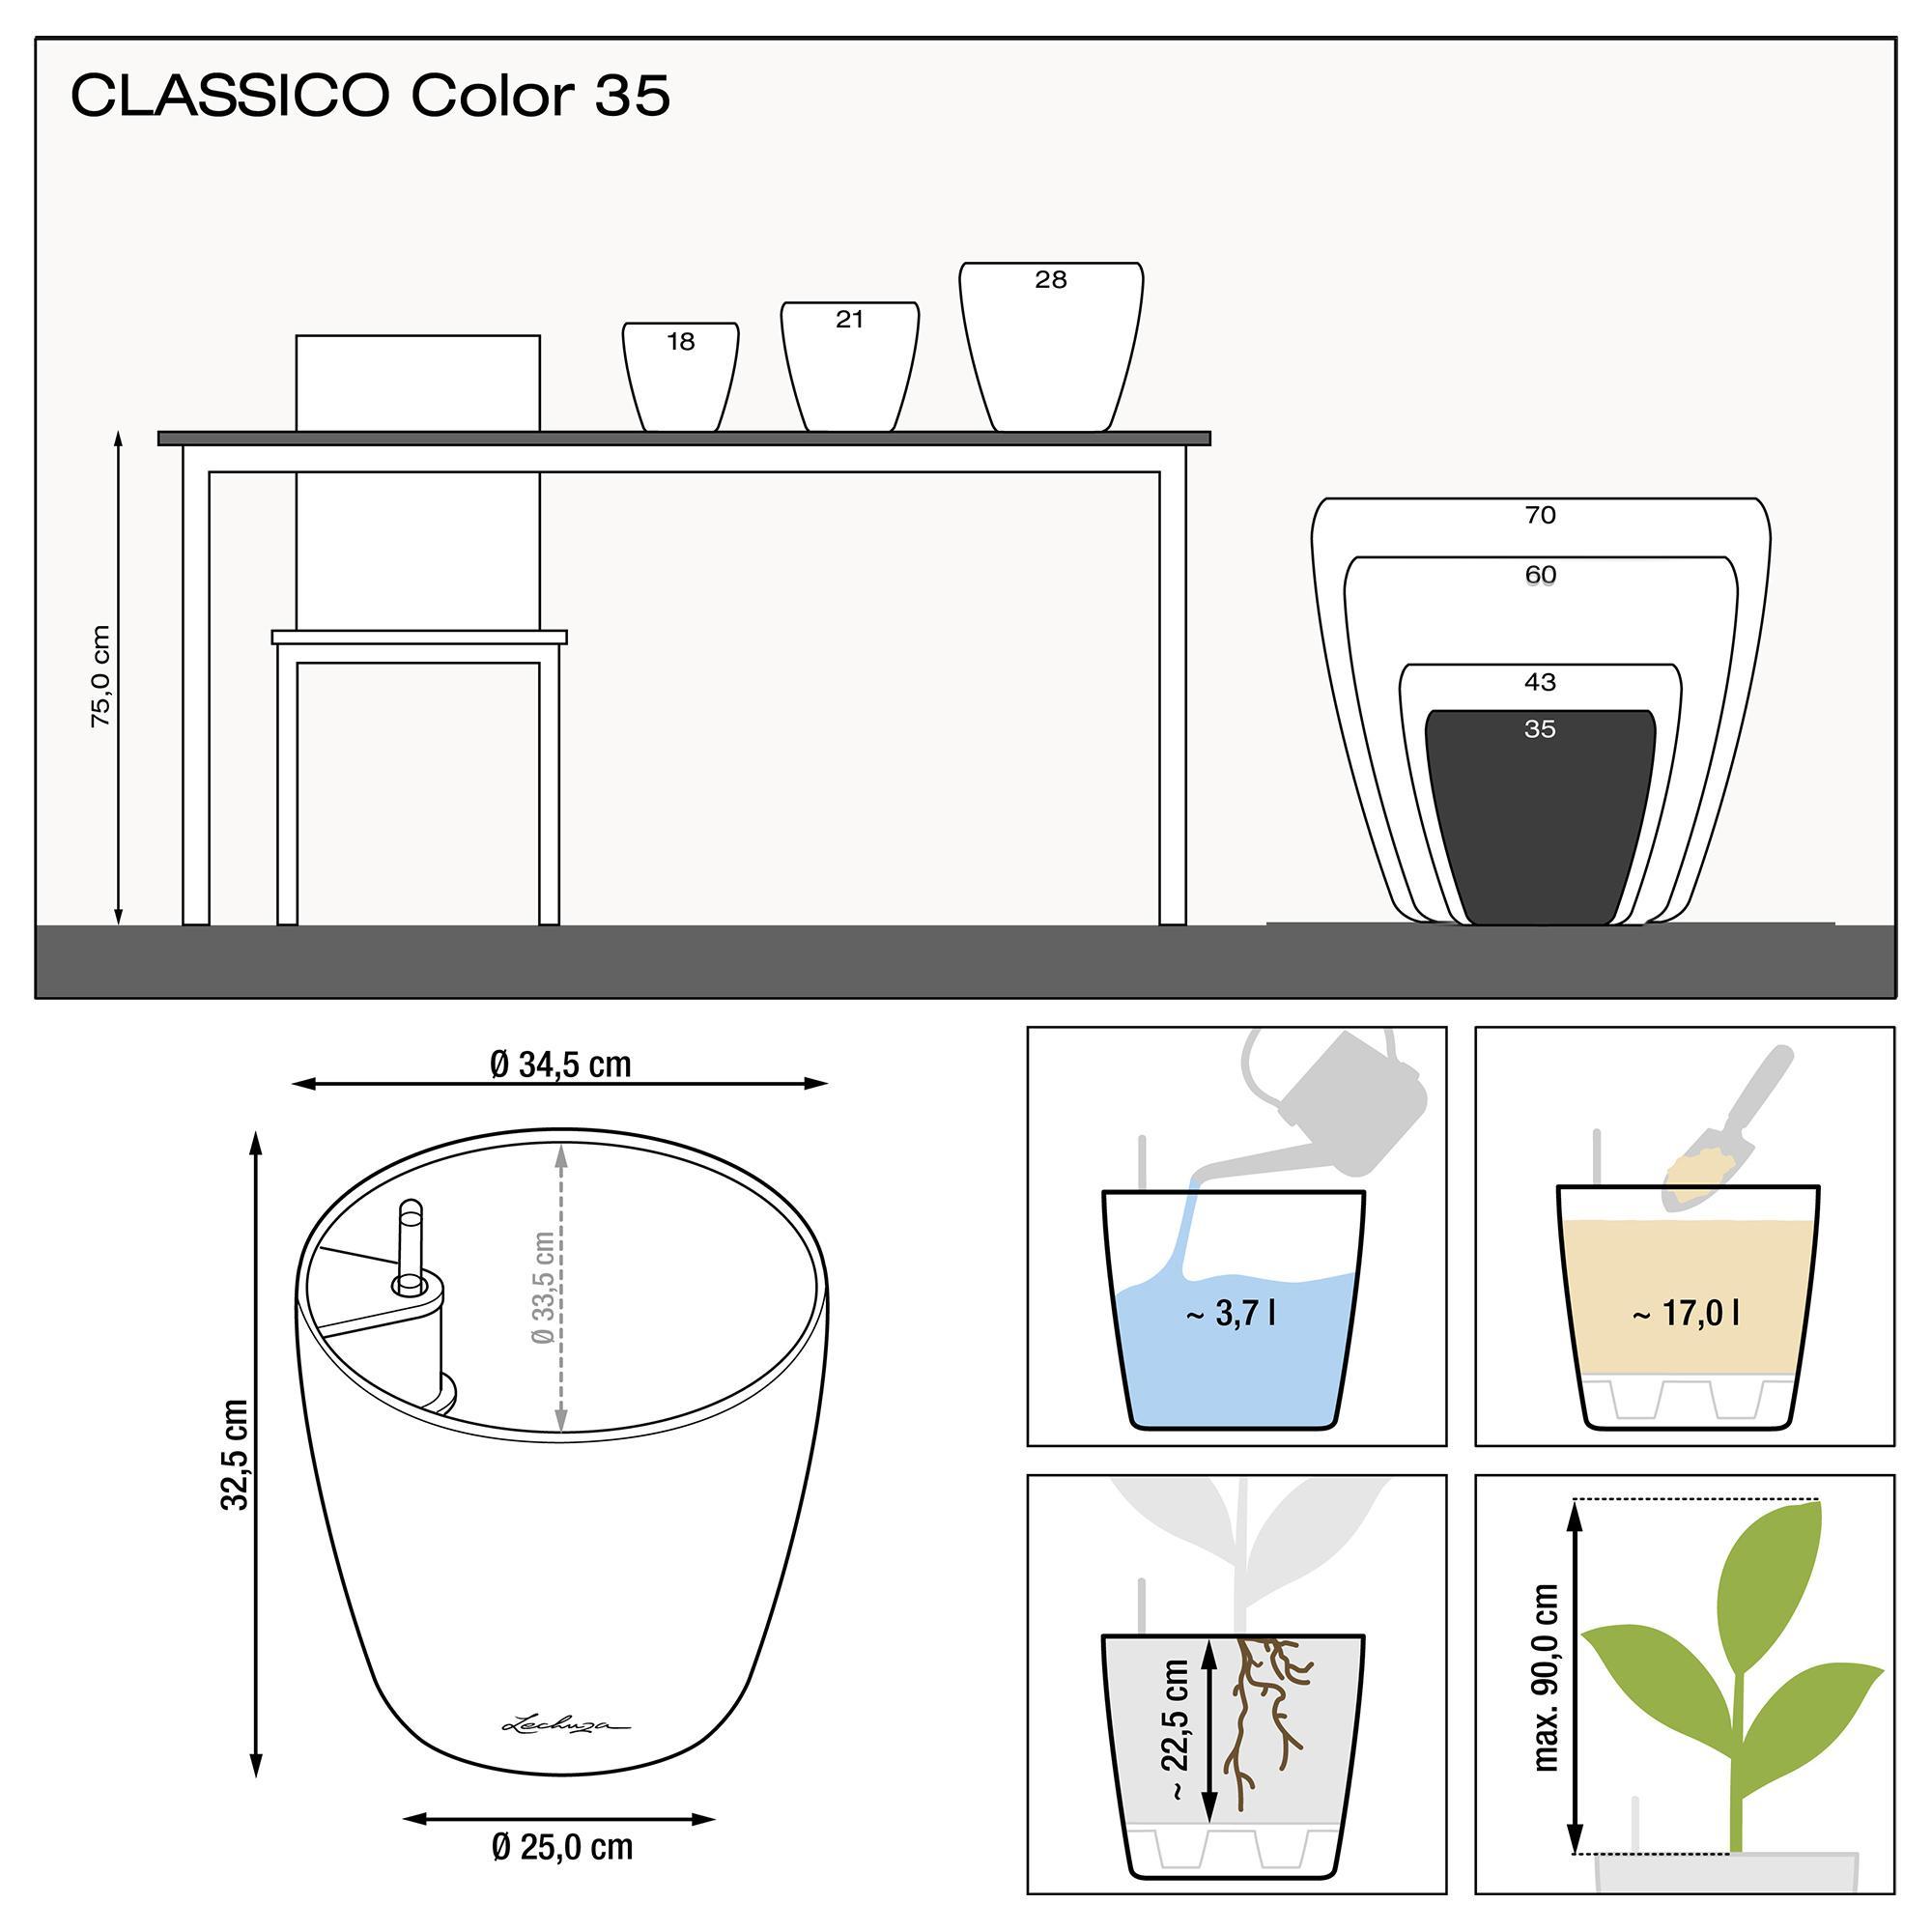 CLASSICO Color 35 nutmeg - Image 2